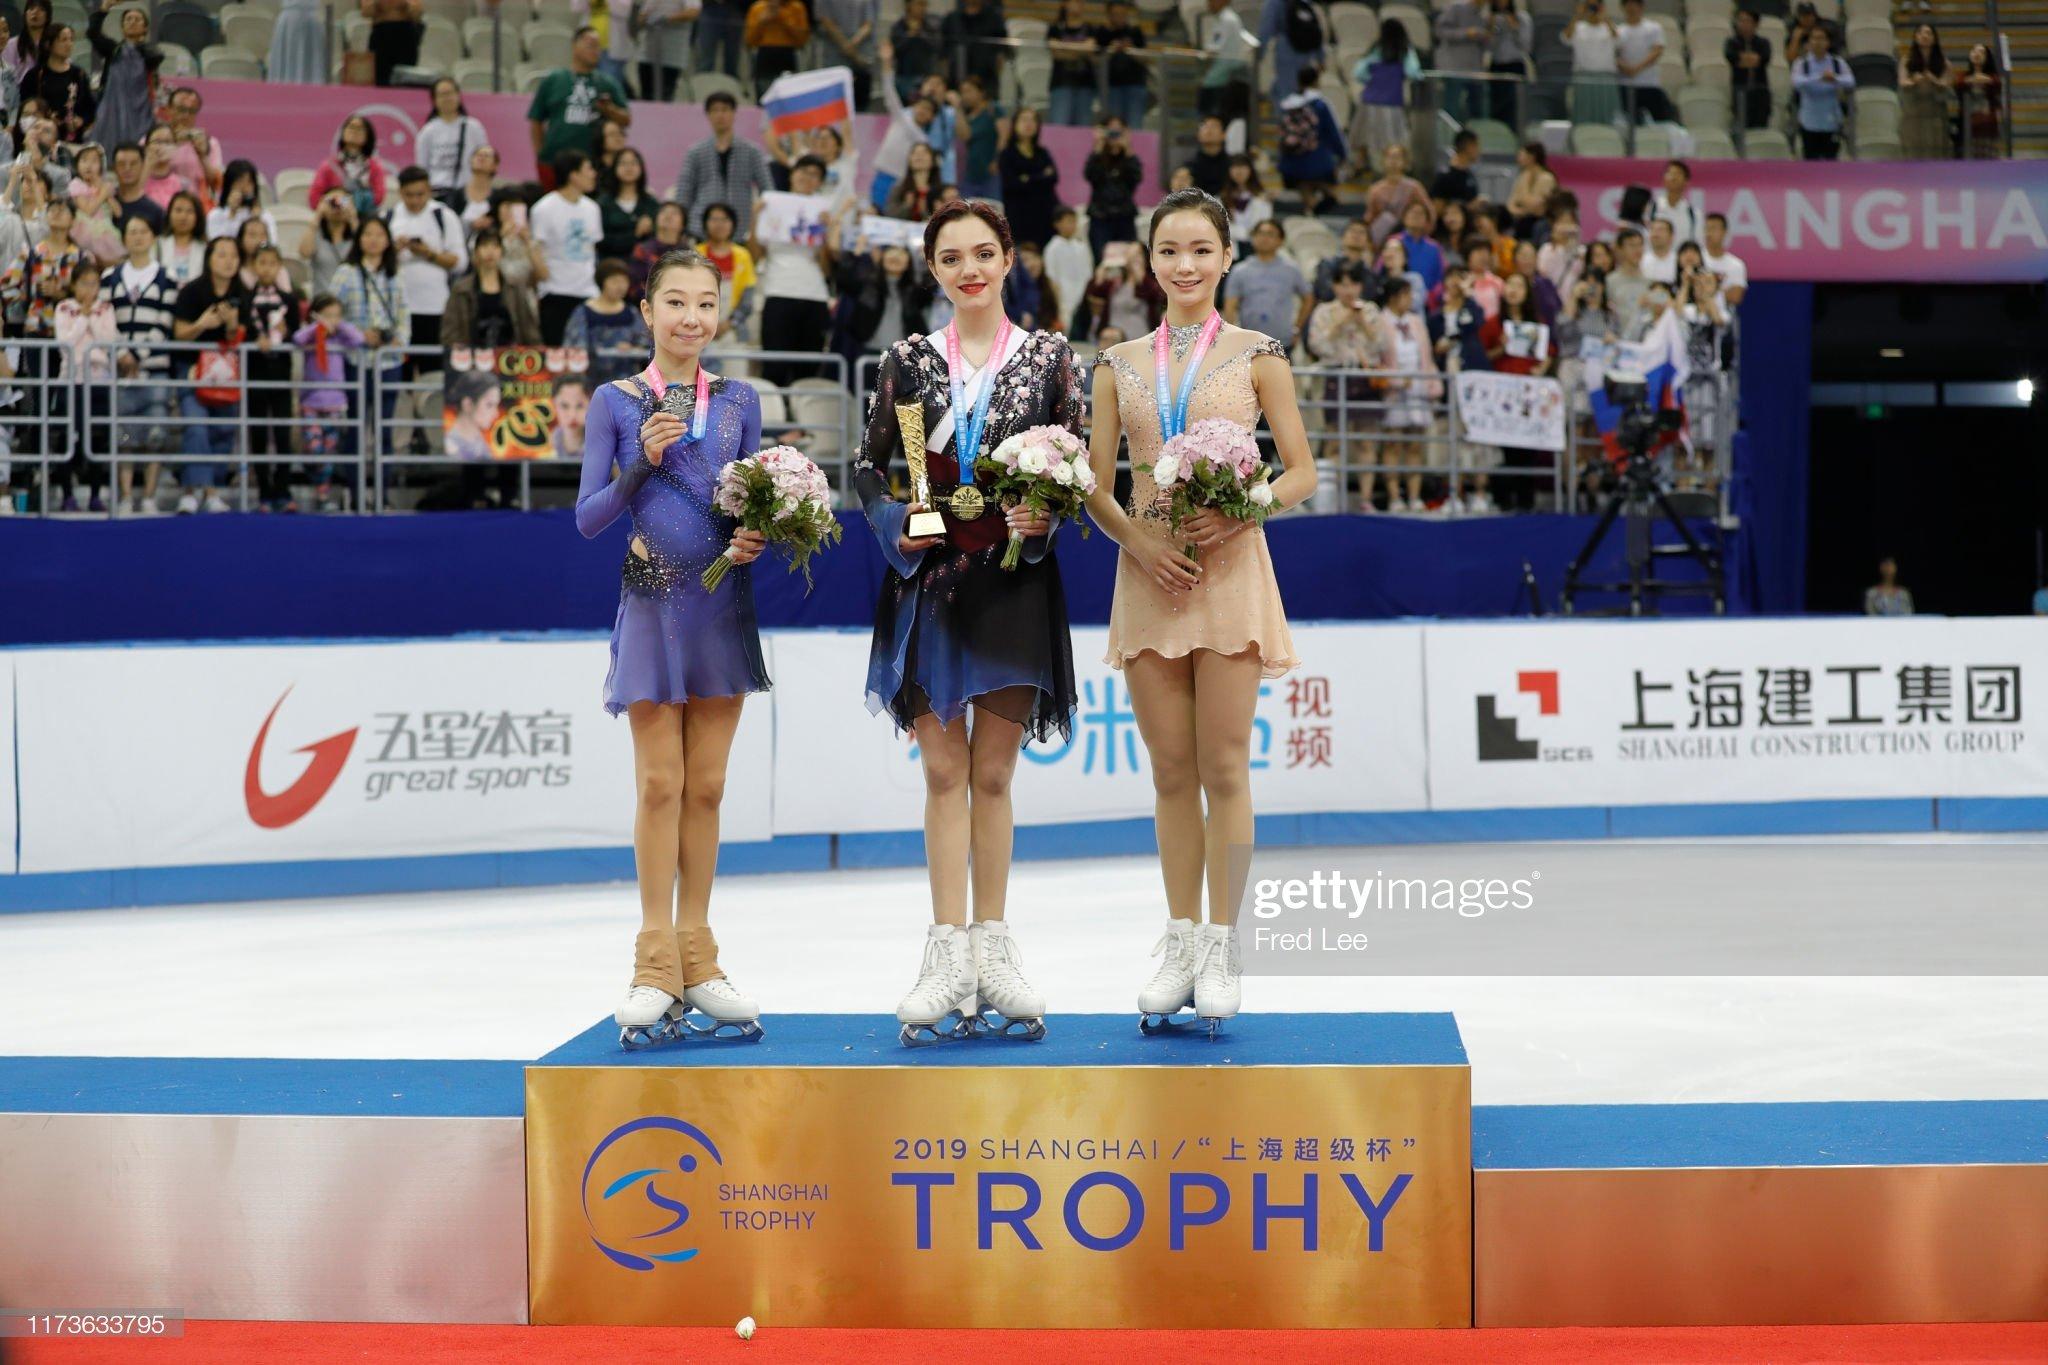 Shanghai Trophy (Invitational). 3-5 октября 2019. Шанхай (Китай) - Страница 6 EGDAAIaXUAAbKgC?format=jpg&name=4096x4096